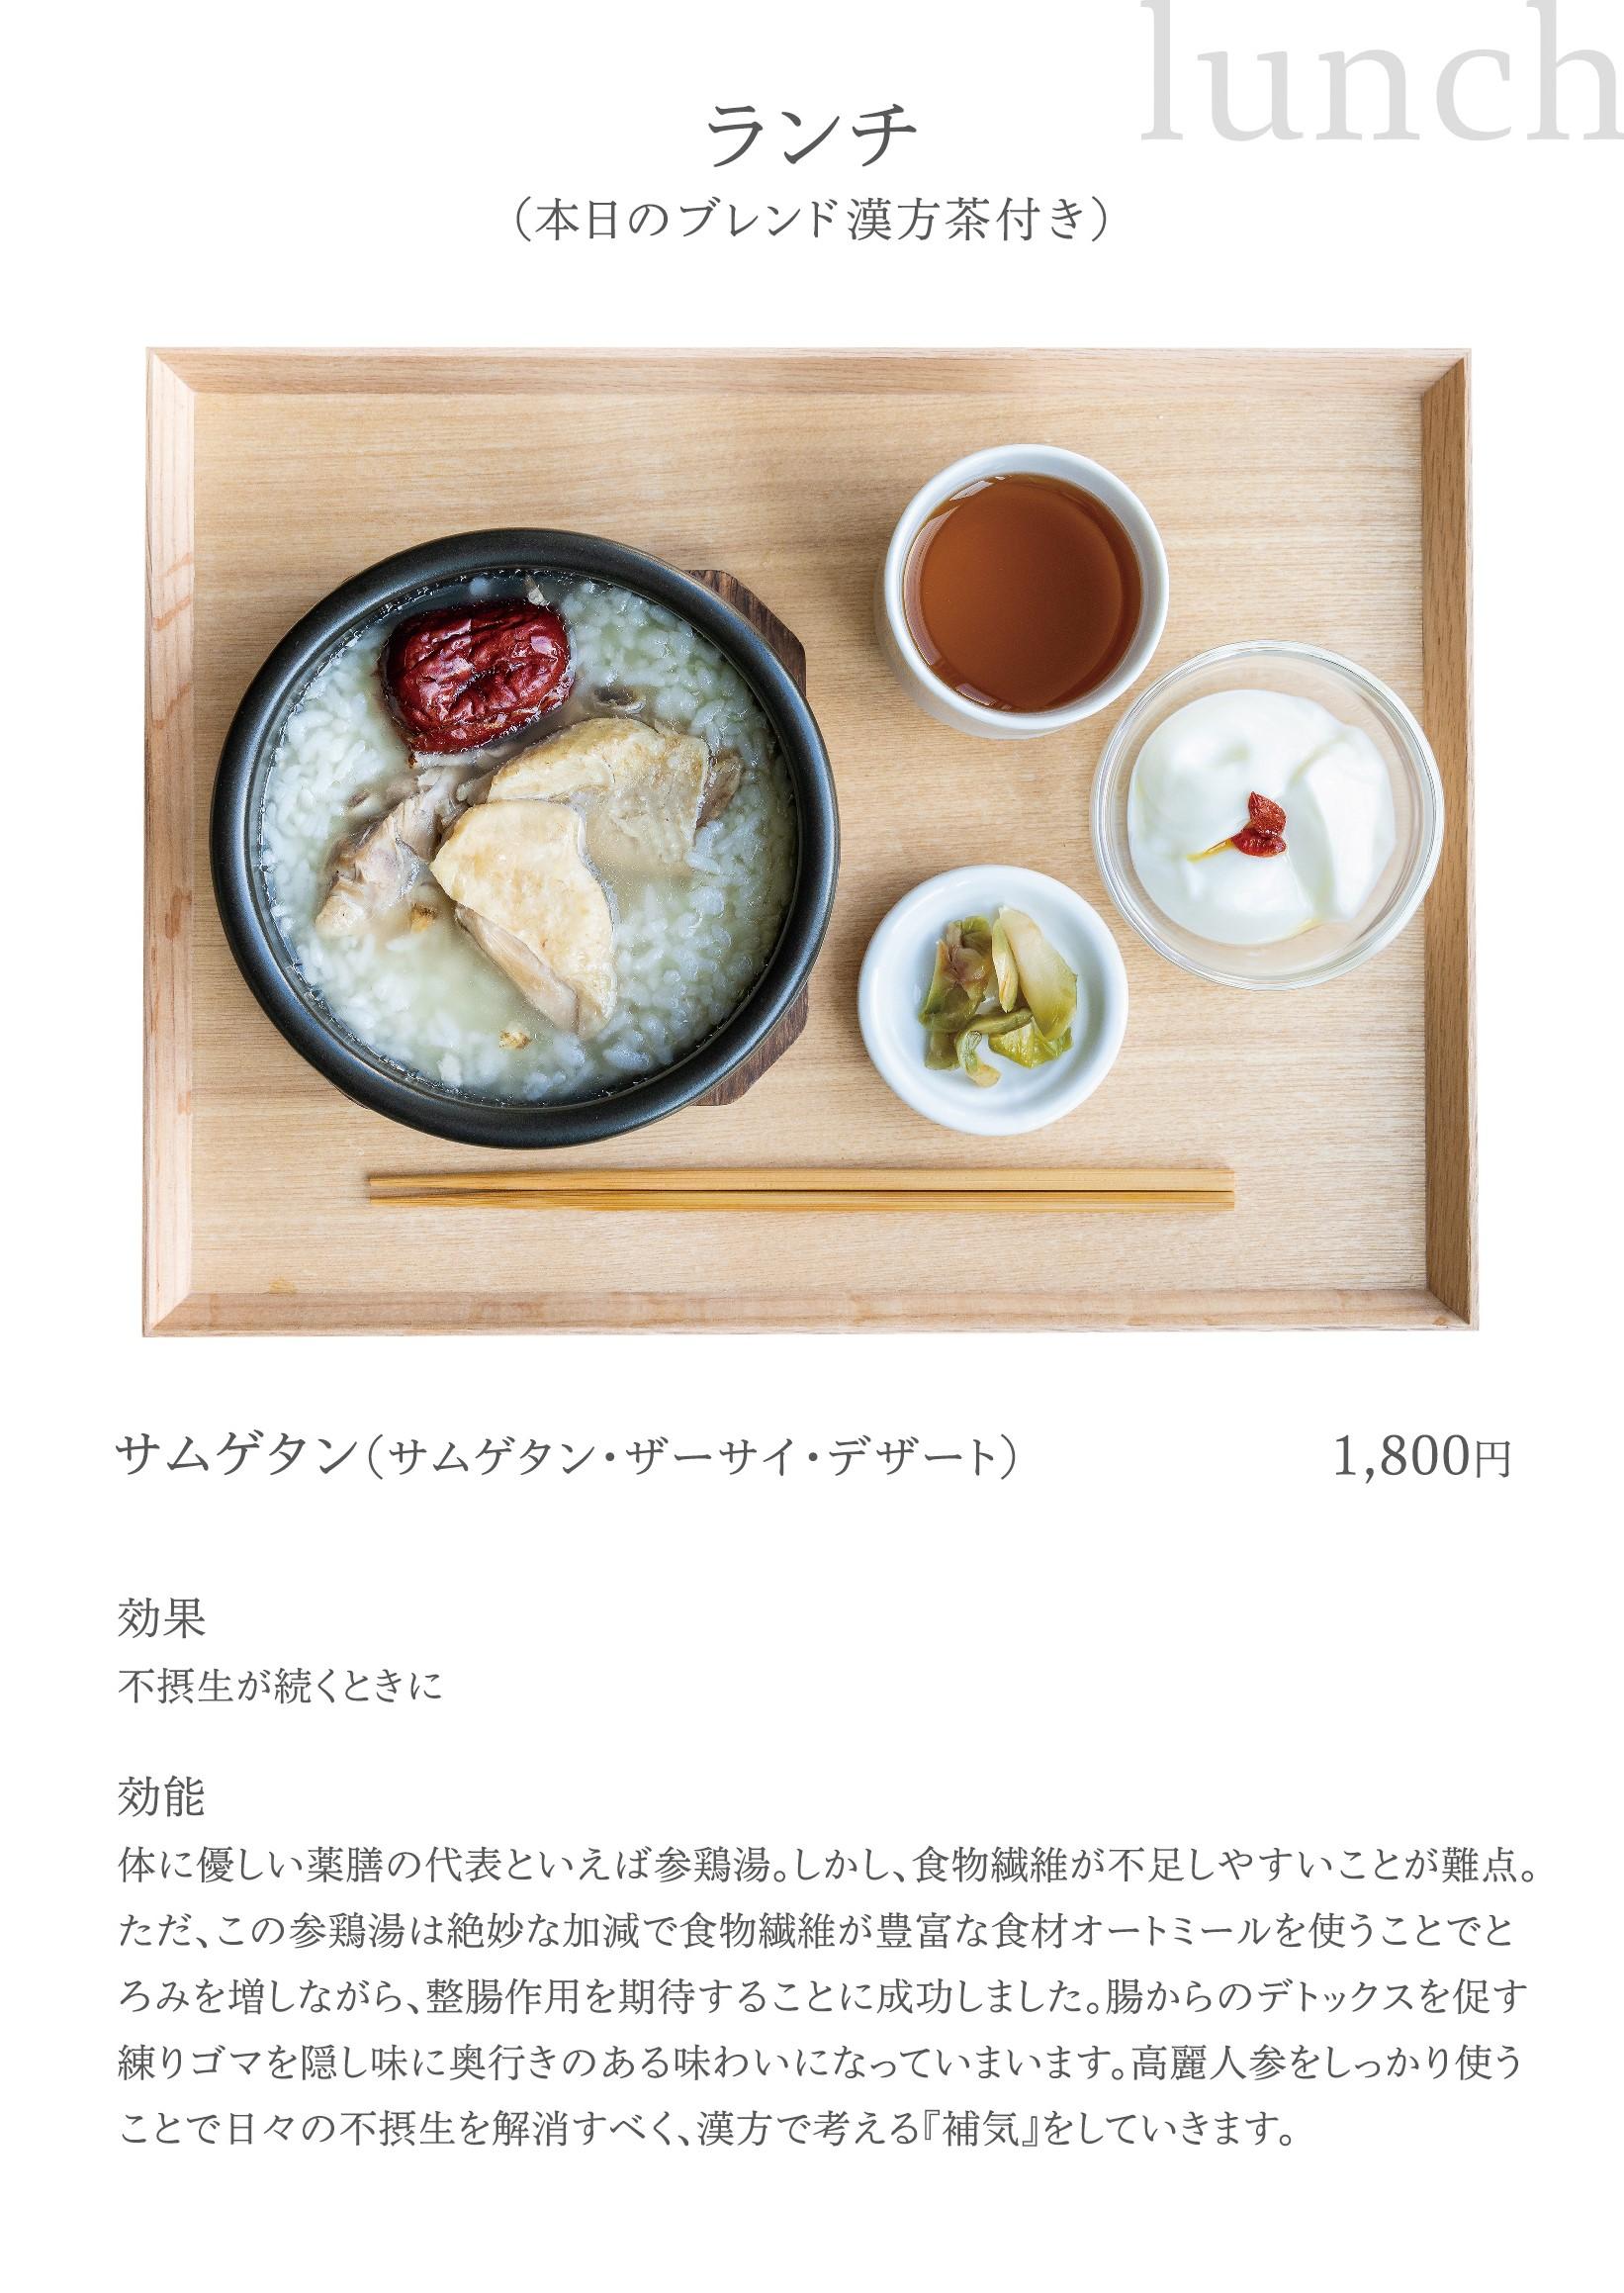 【NEW!!】コぺルタランチメニュー表